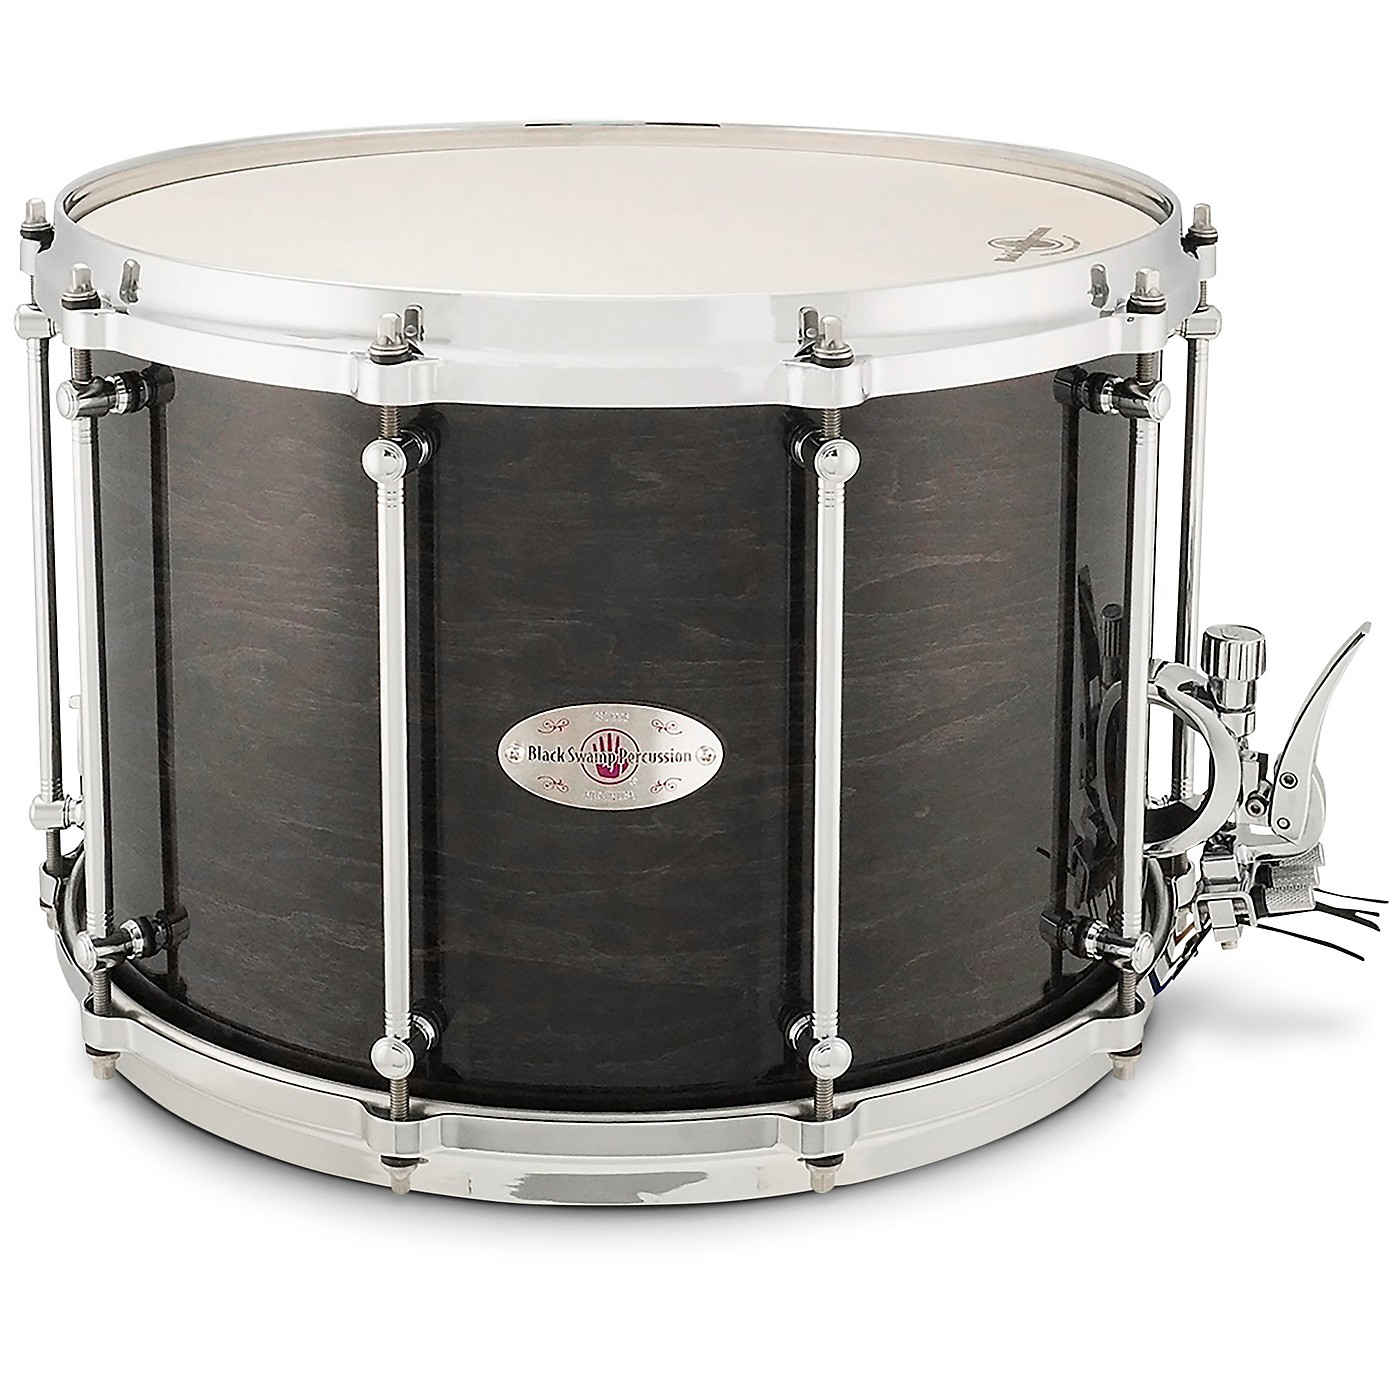 Black Swamp Percussion Symphonic Field Drum thumbnail